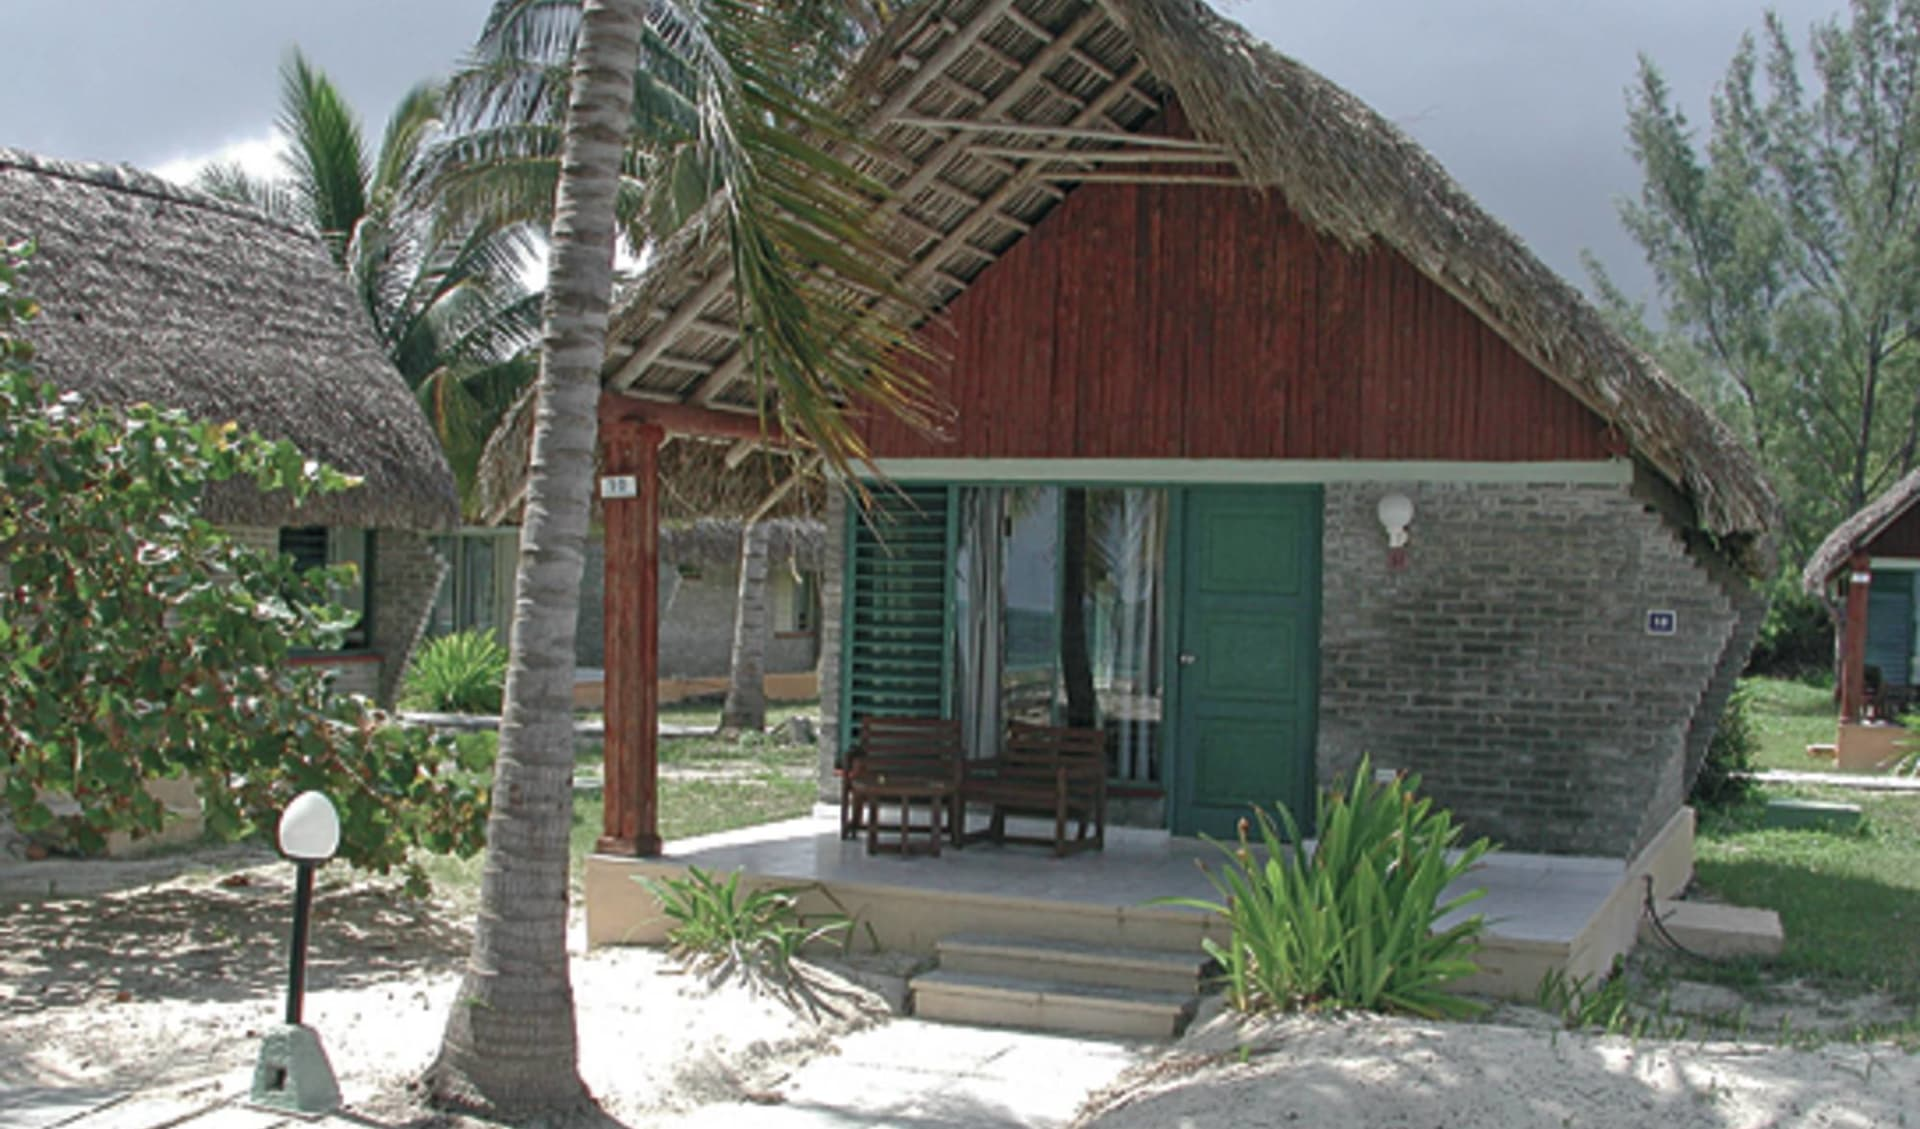 Horizontes Cayo Levisa: exterior horizontes cayo levisa bungalow